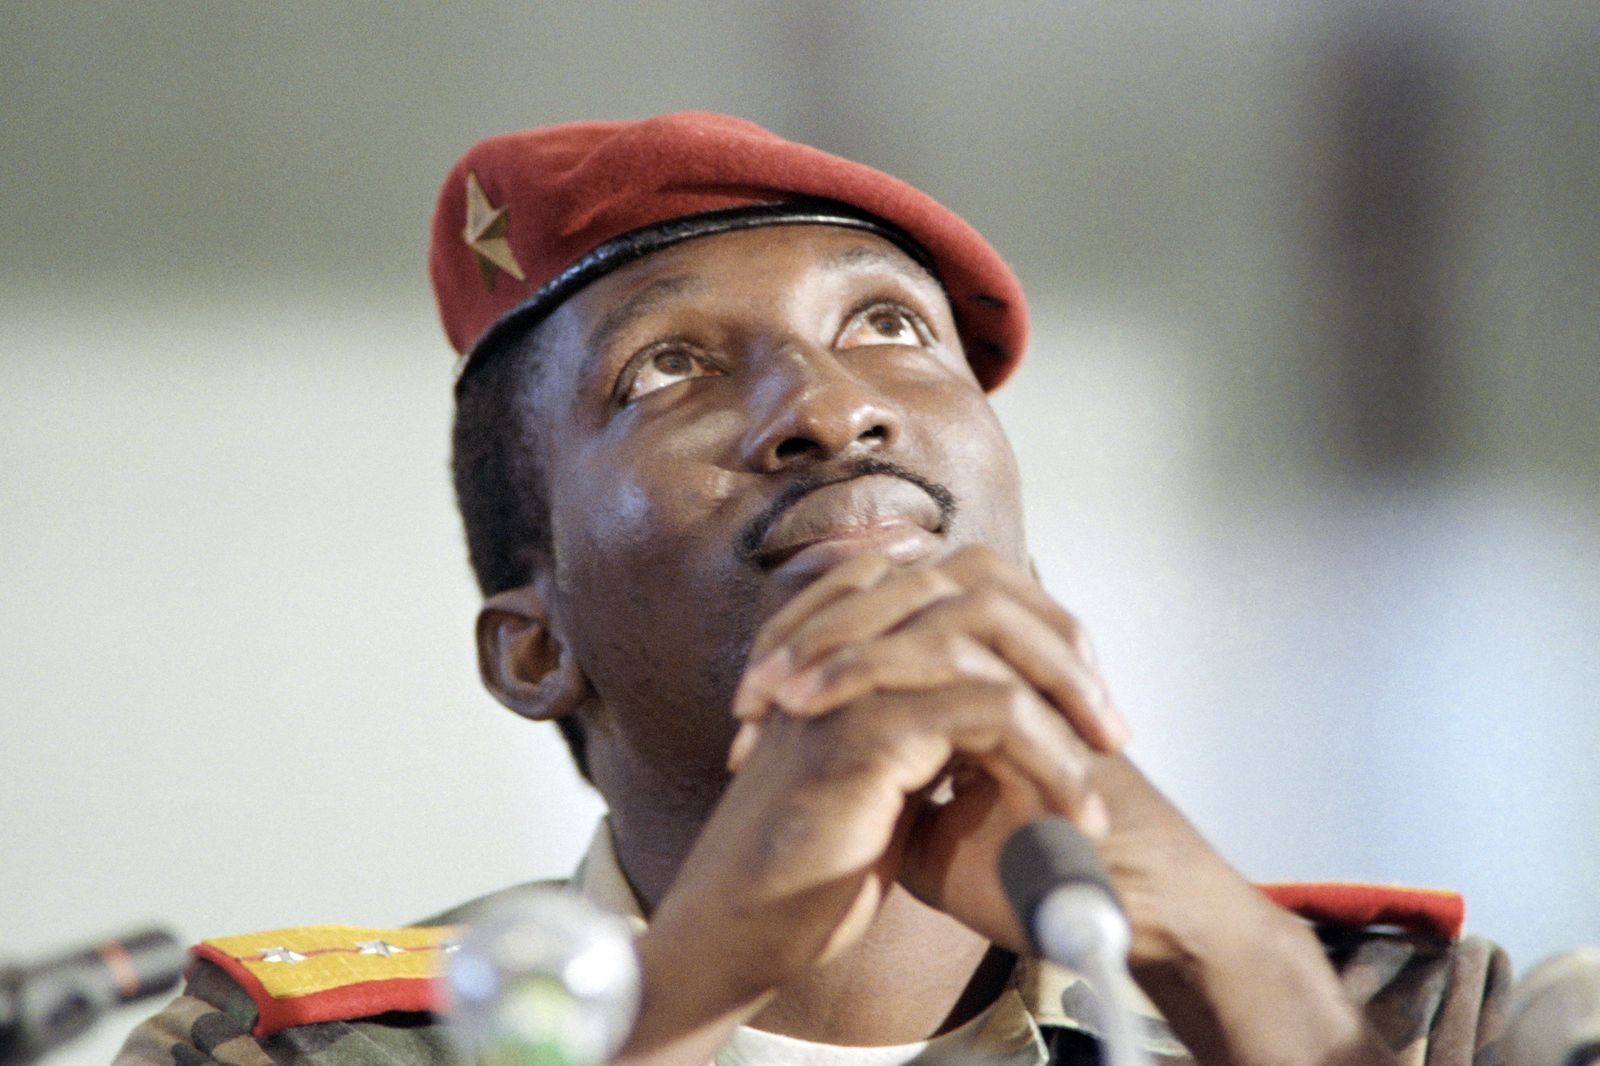 ZIMBABWE-THOMAS SANKARA-SUMMIT